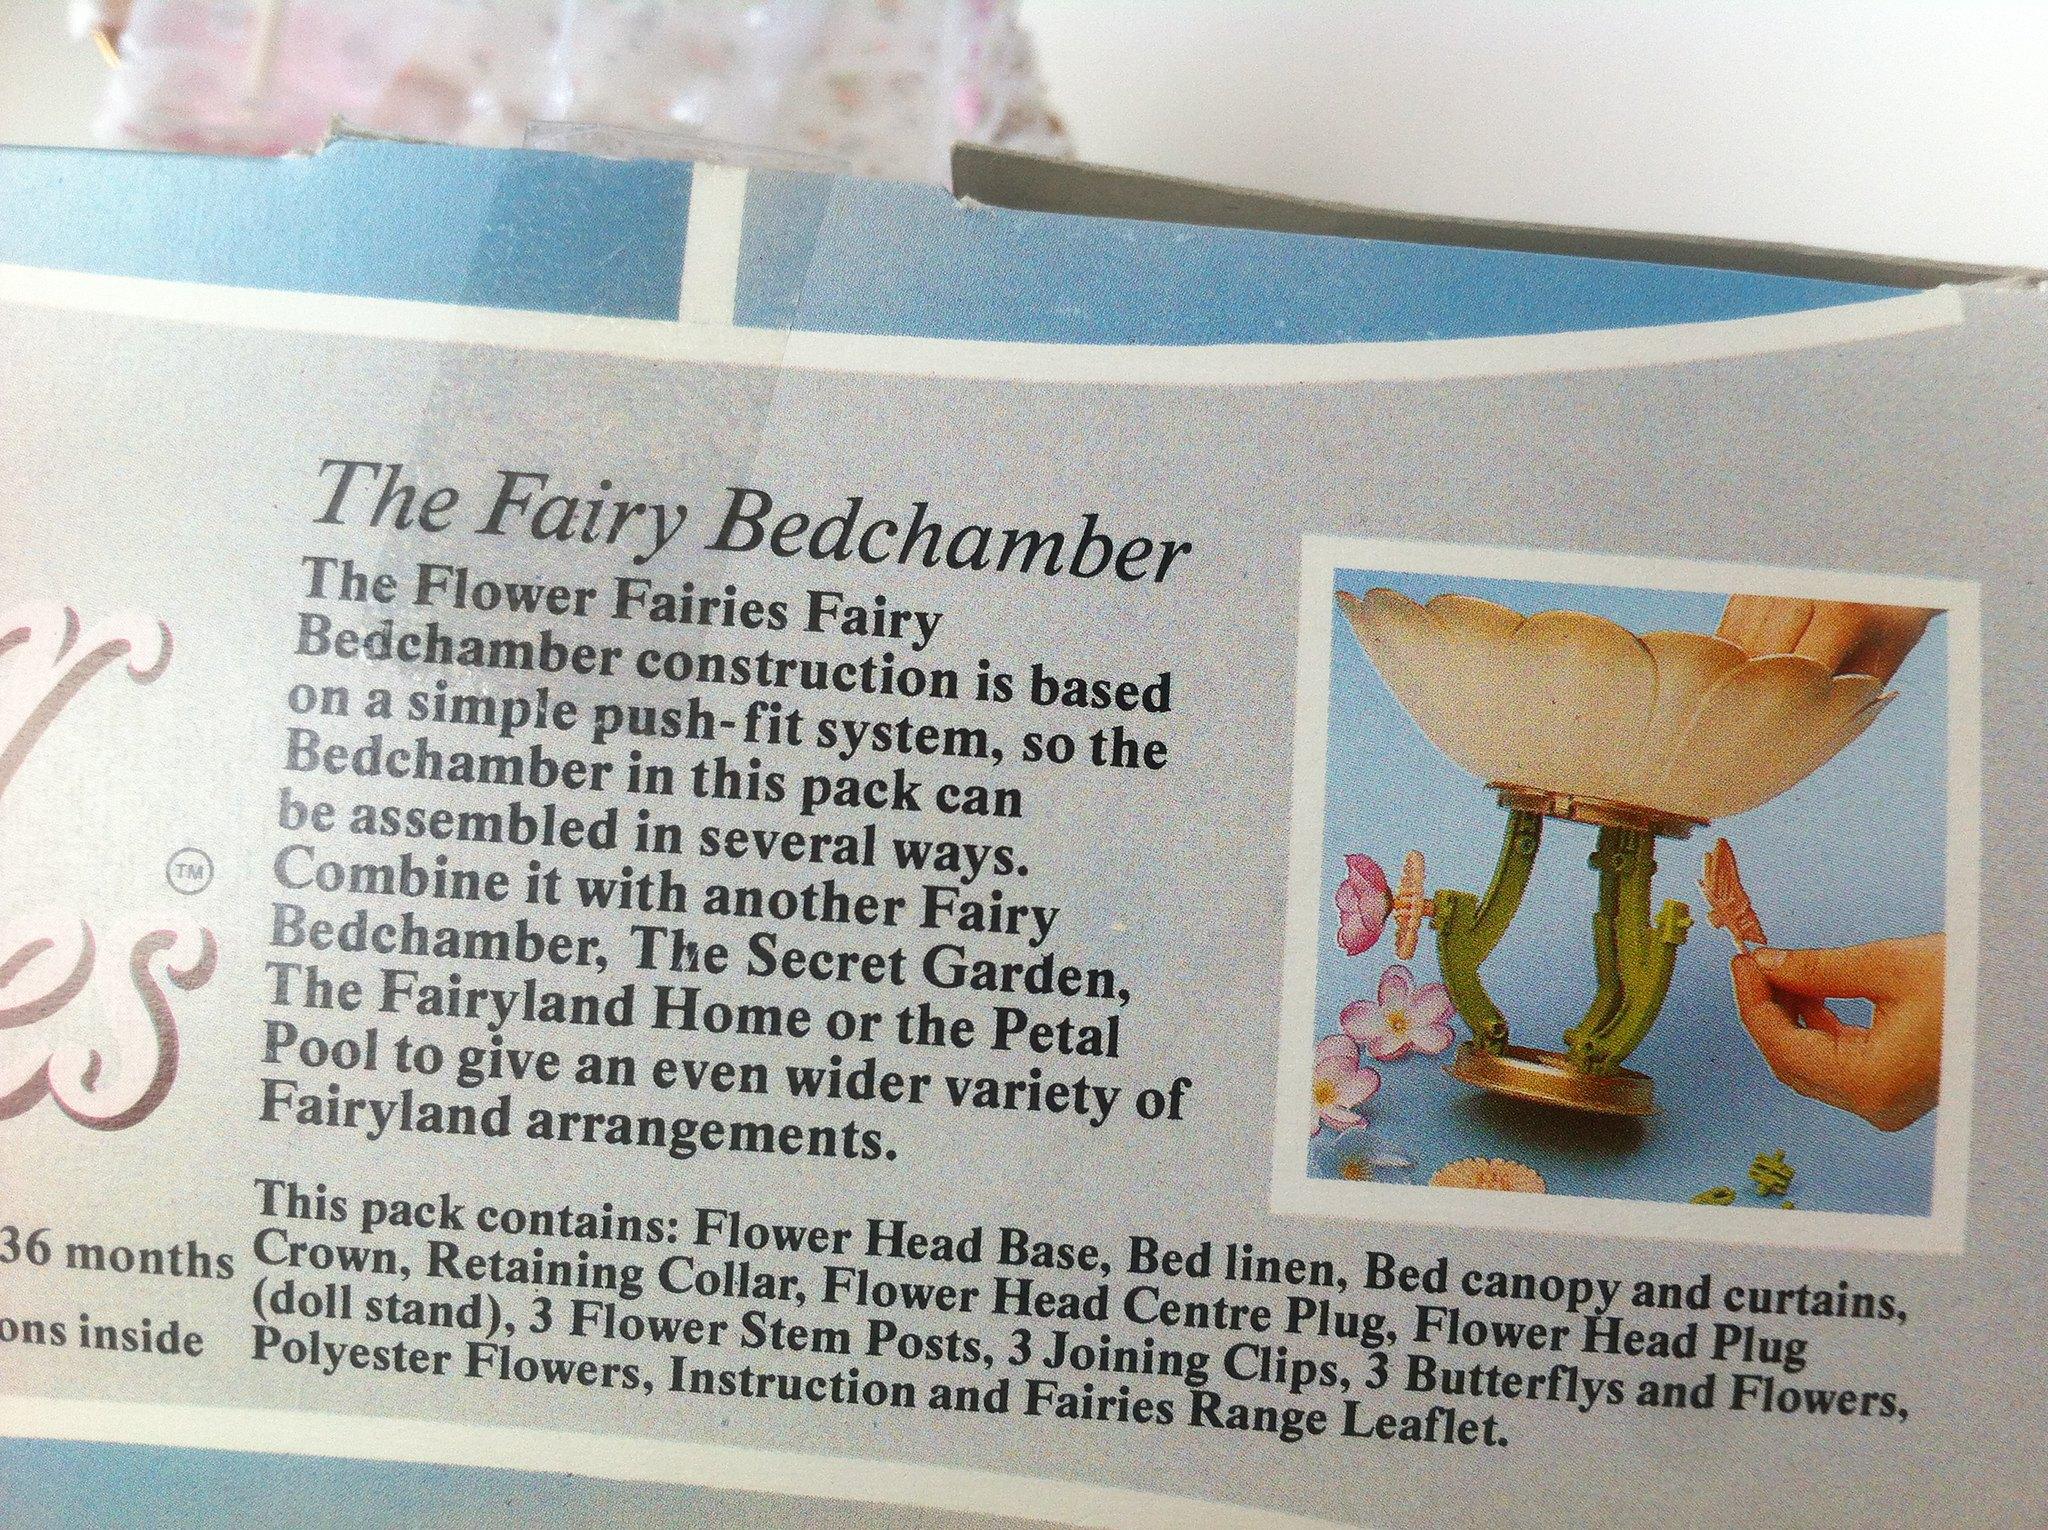 Fairy Bedchamber contents